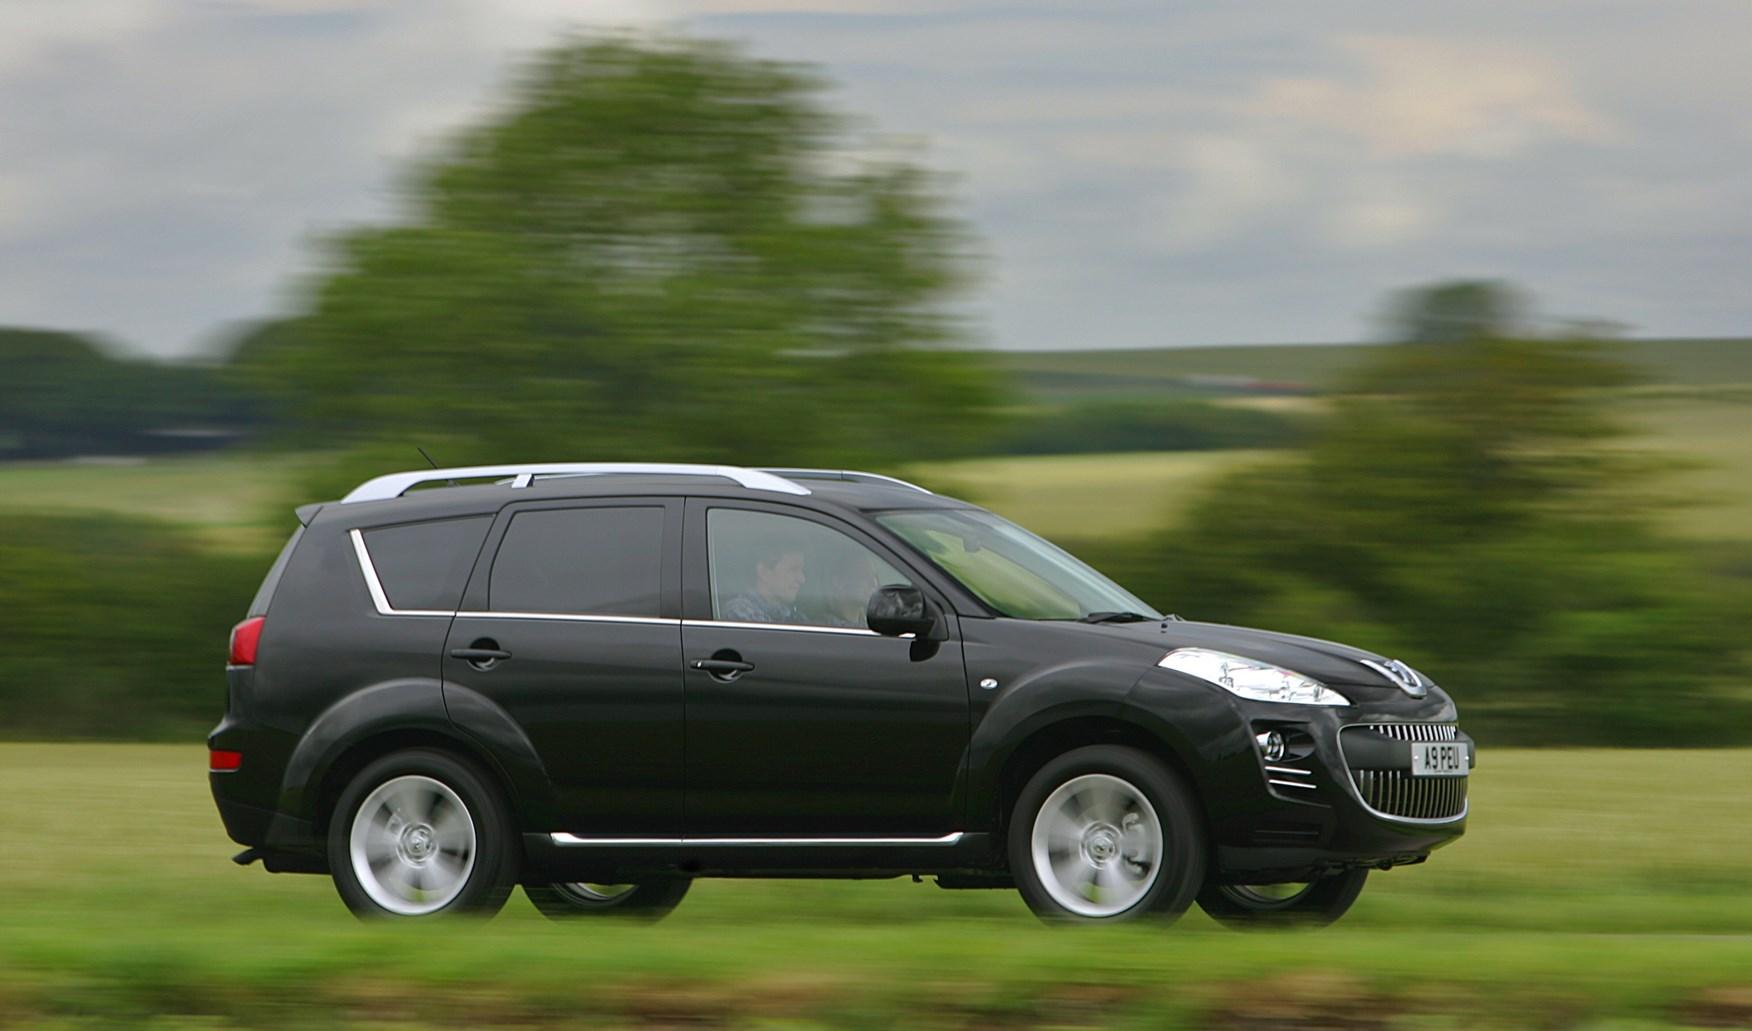 Peugeot 4007 Hatchback Review (2007 - 2012) | Parkers